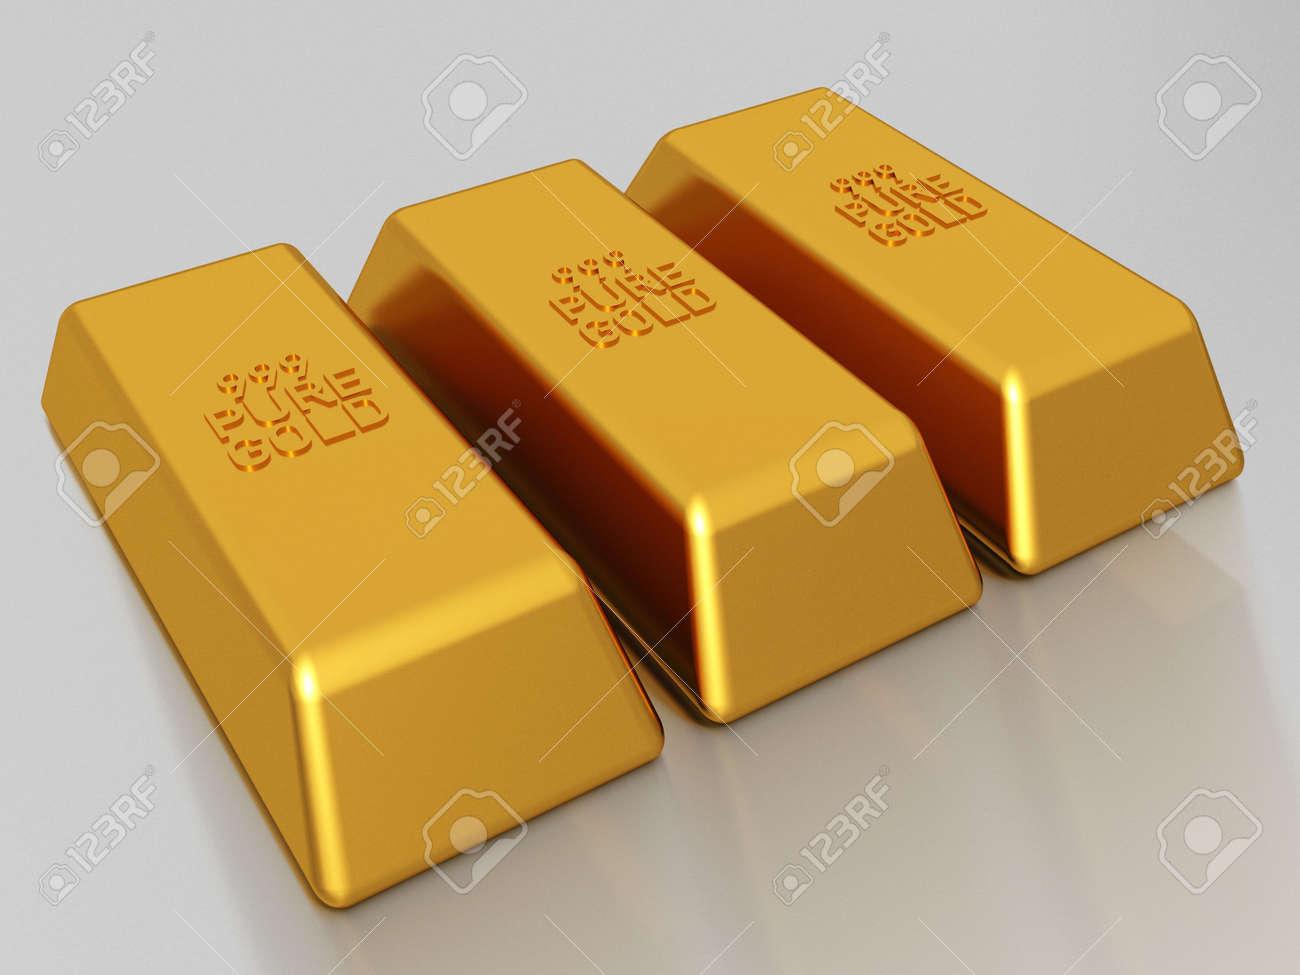 Gold bars of 999 pure gold bullion Stock Photo - 2836439